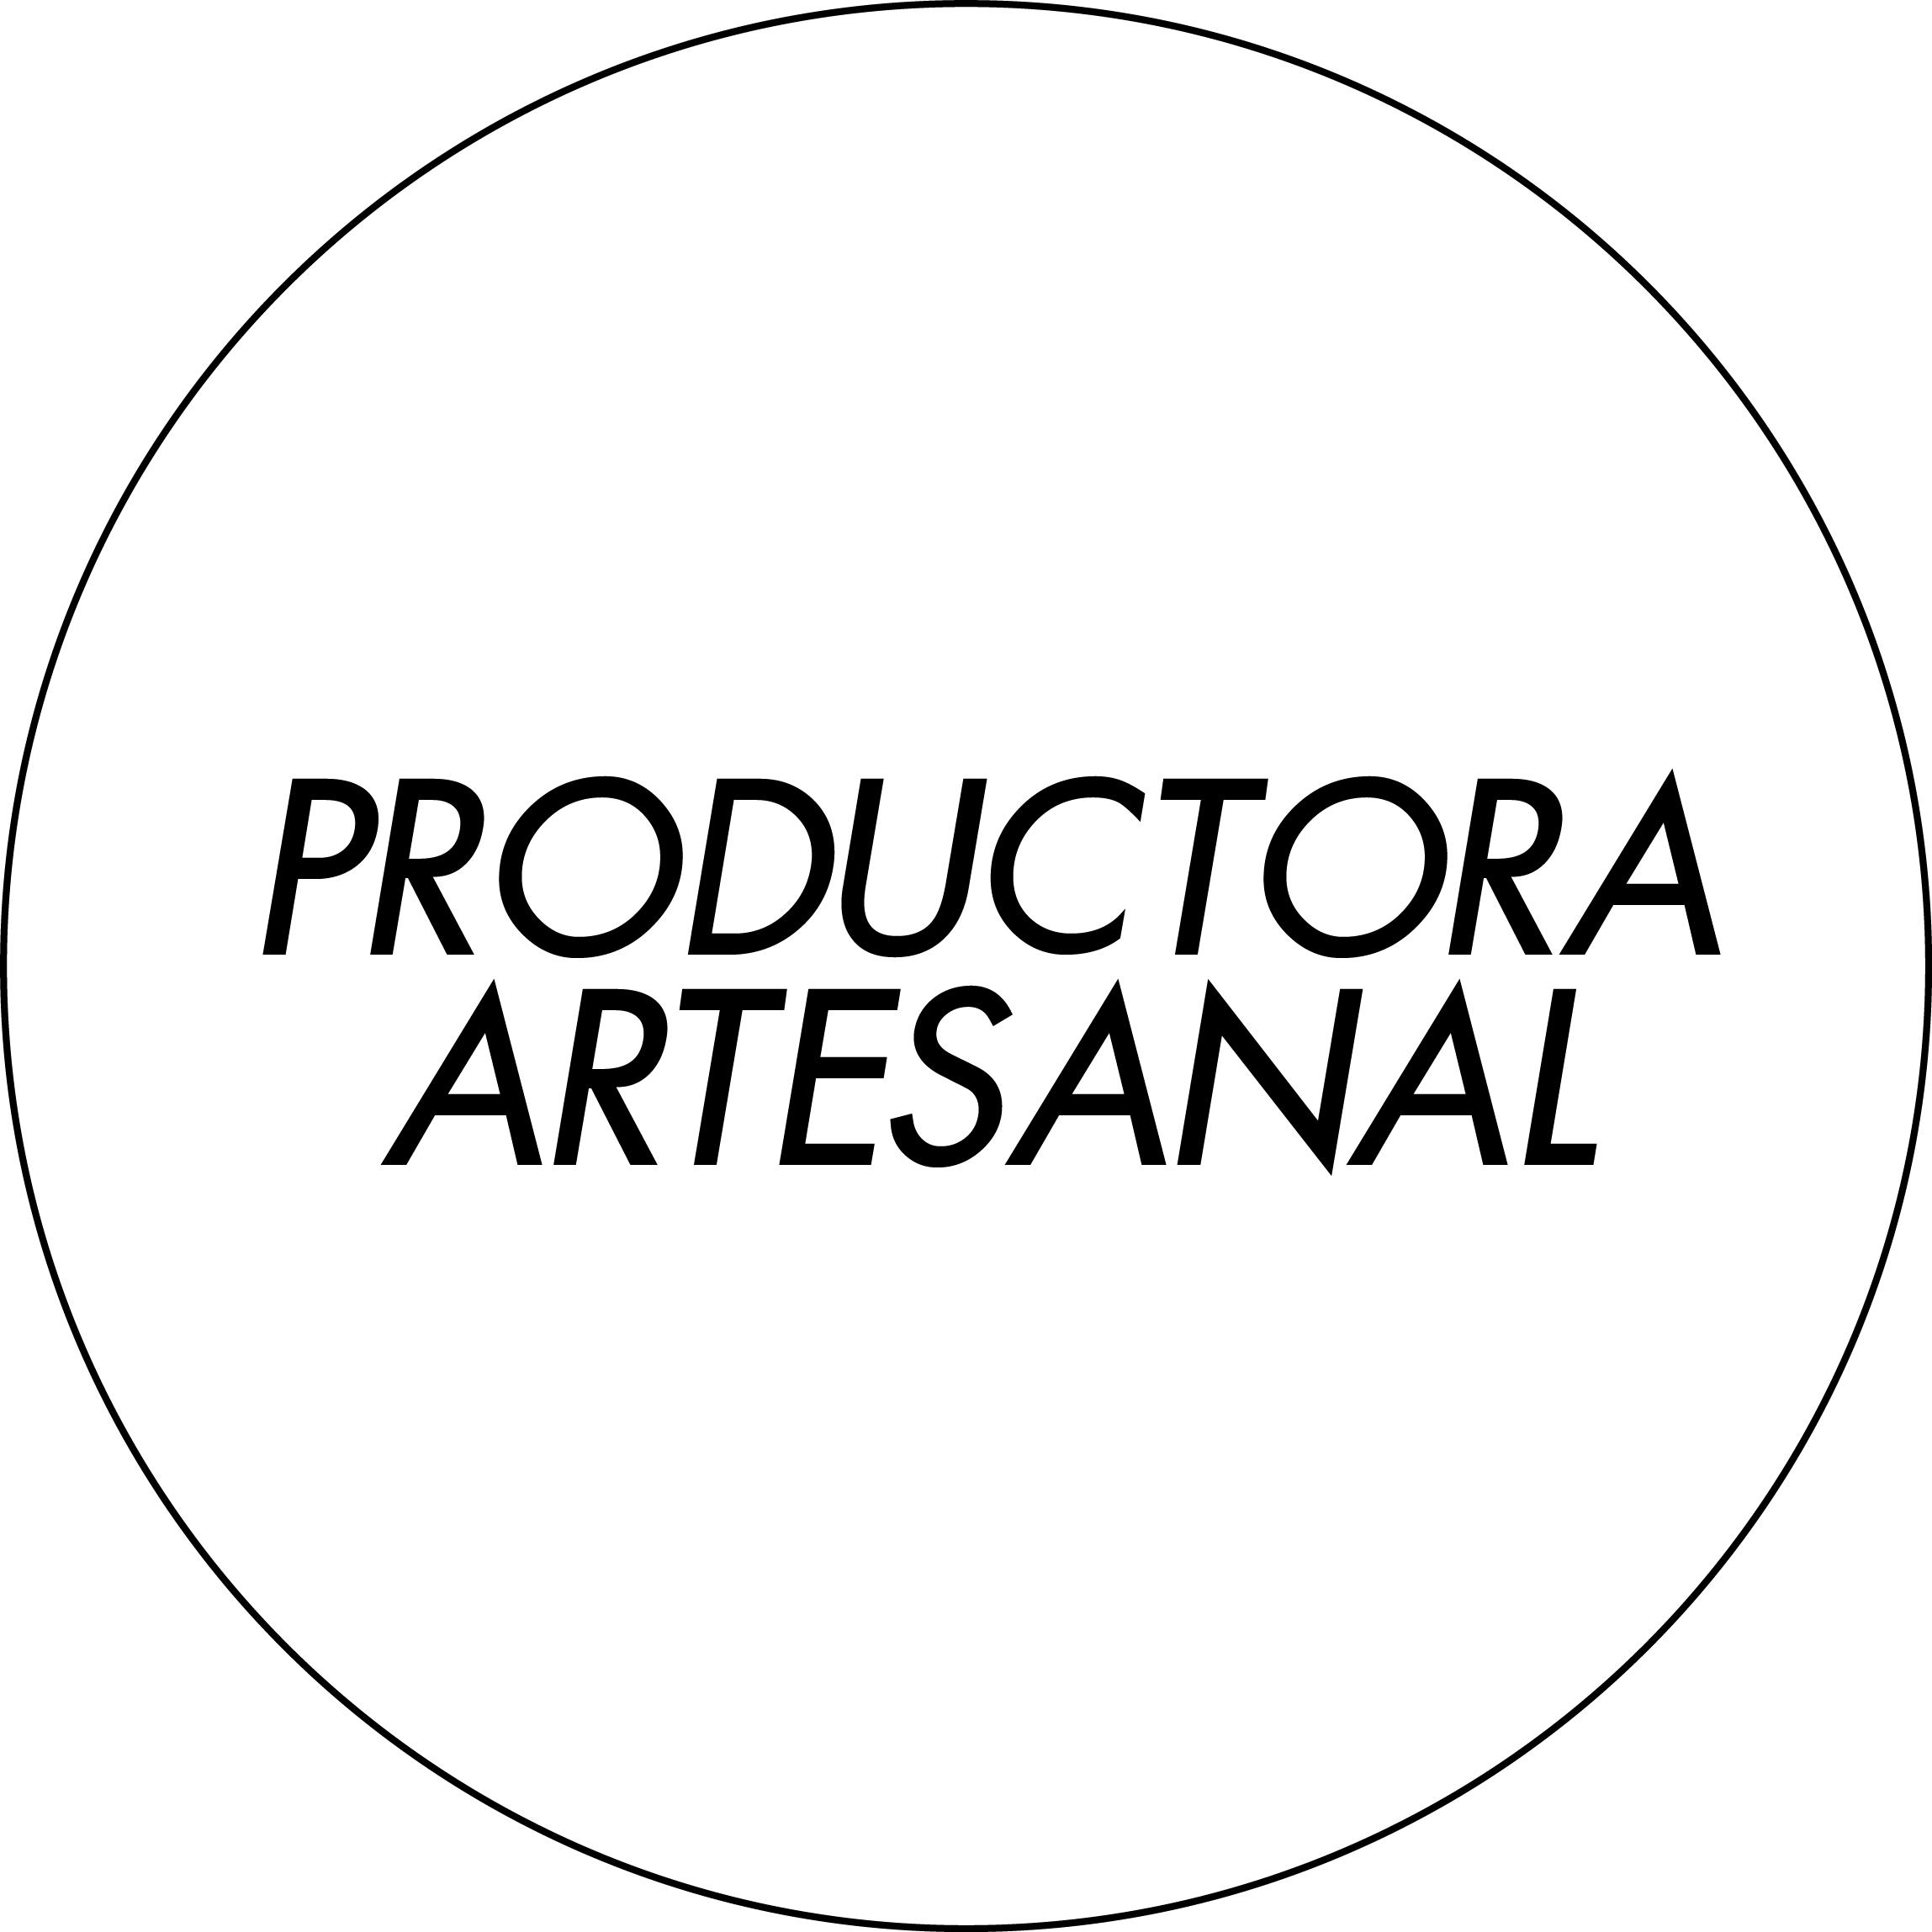 PRODUCTORA ARTESANAL